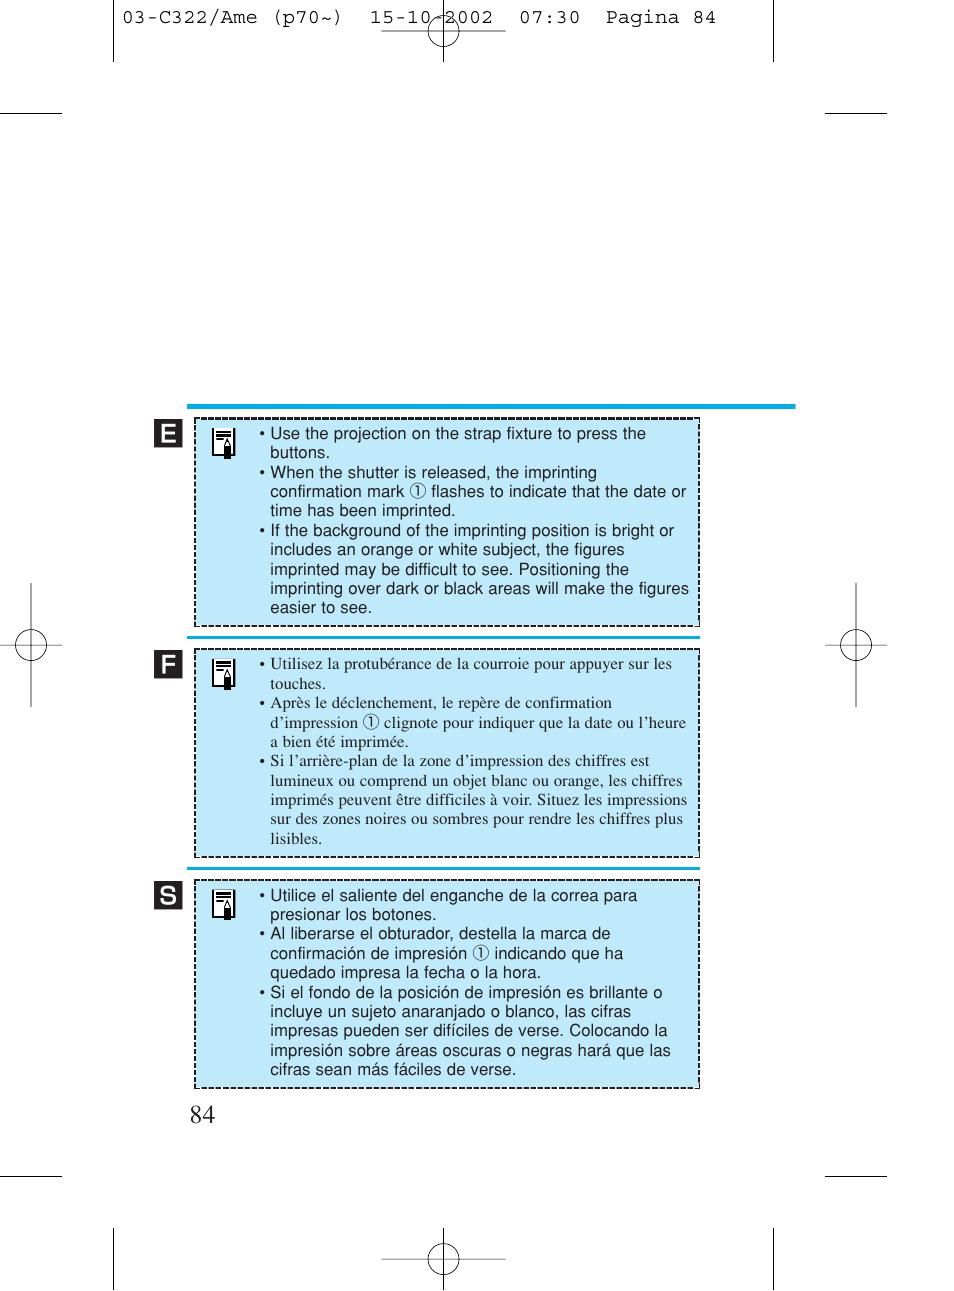 canon prima bf 80 set user manual page 84 115 original mode rh manualsdir com prima lpr730 user manual prima 100 lwd user manual